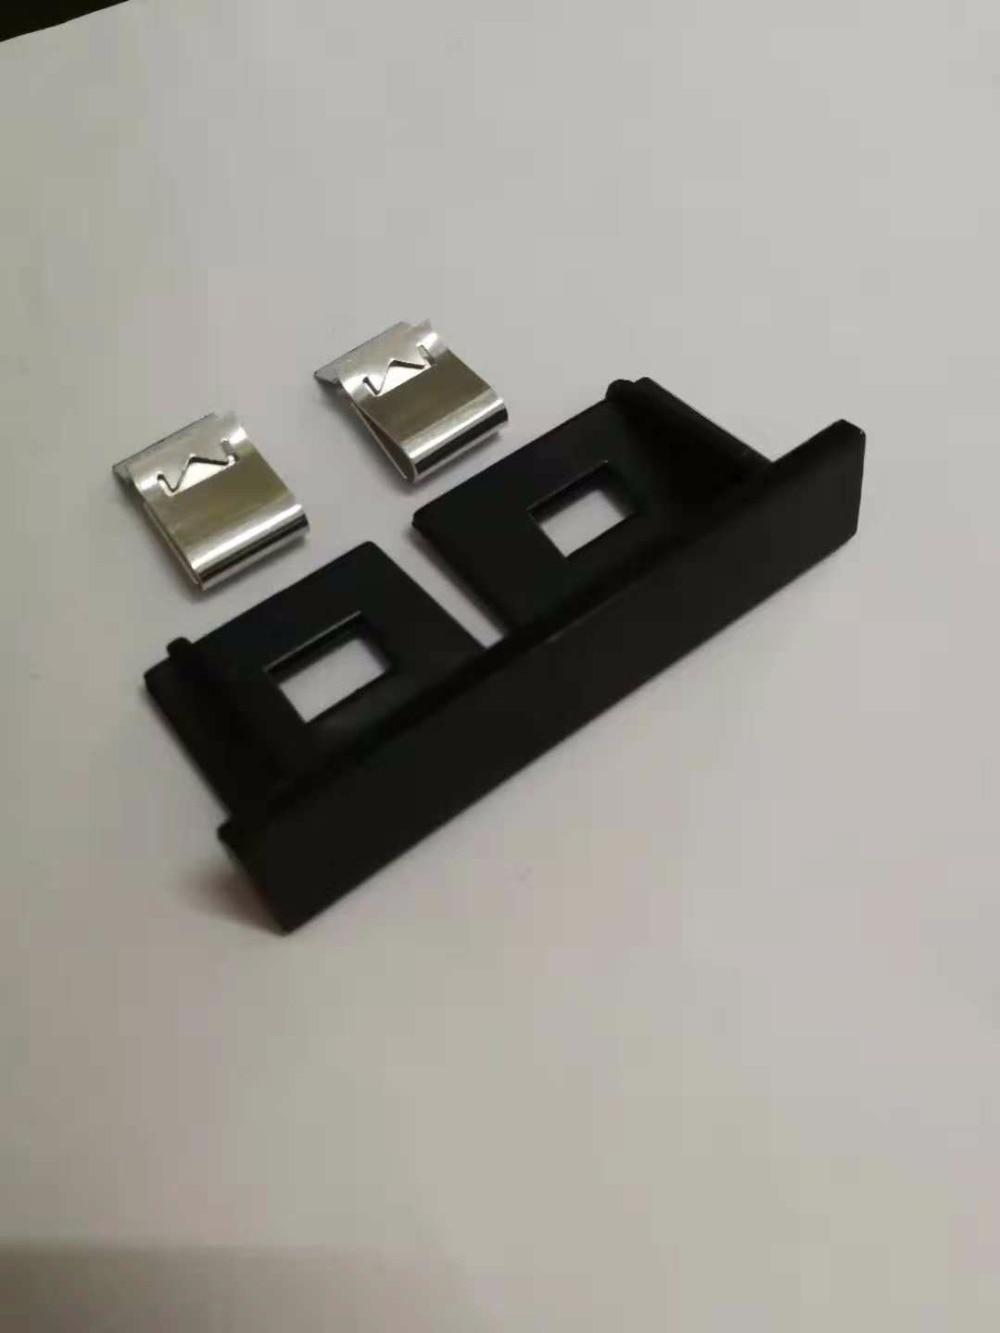 Black S Line Quattro Silver Matt Grill Badges Emblem Sticker For New Model Audi